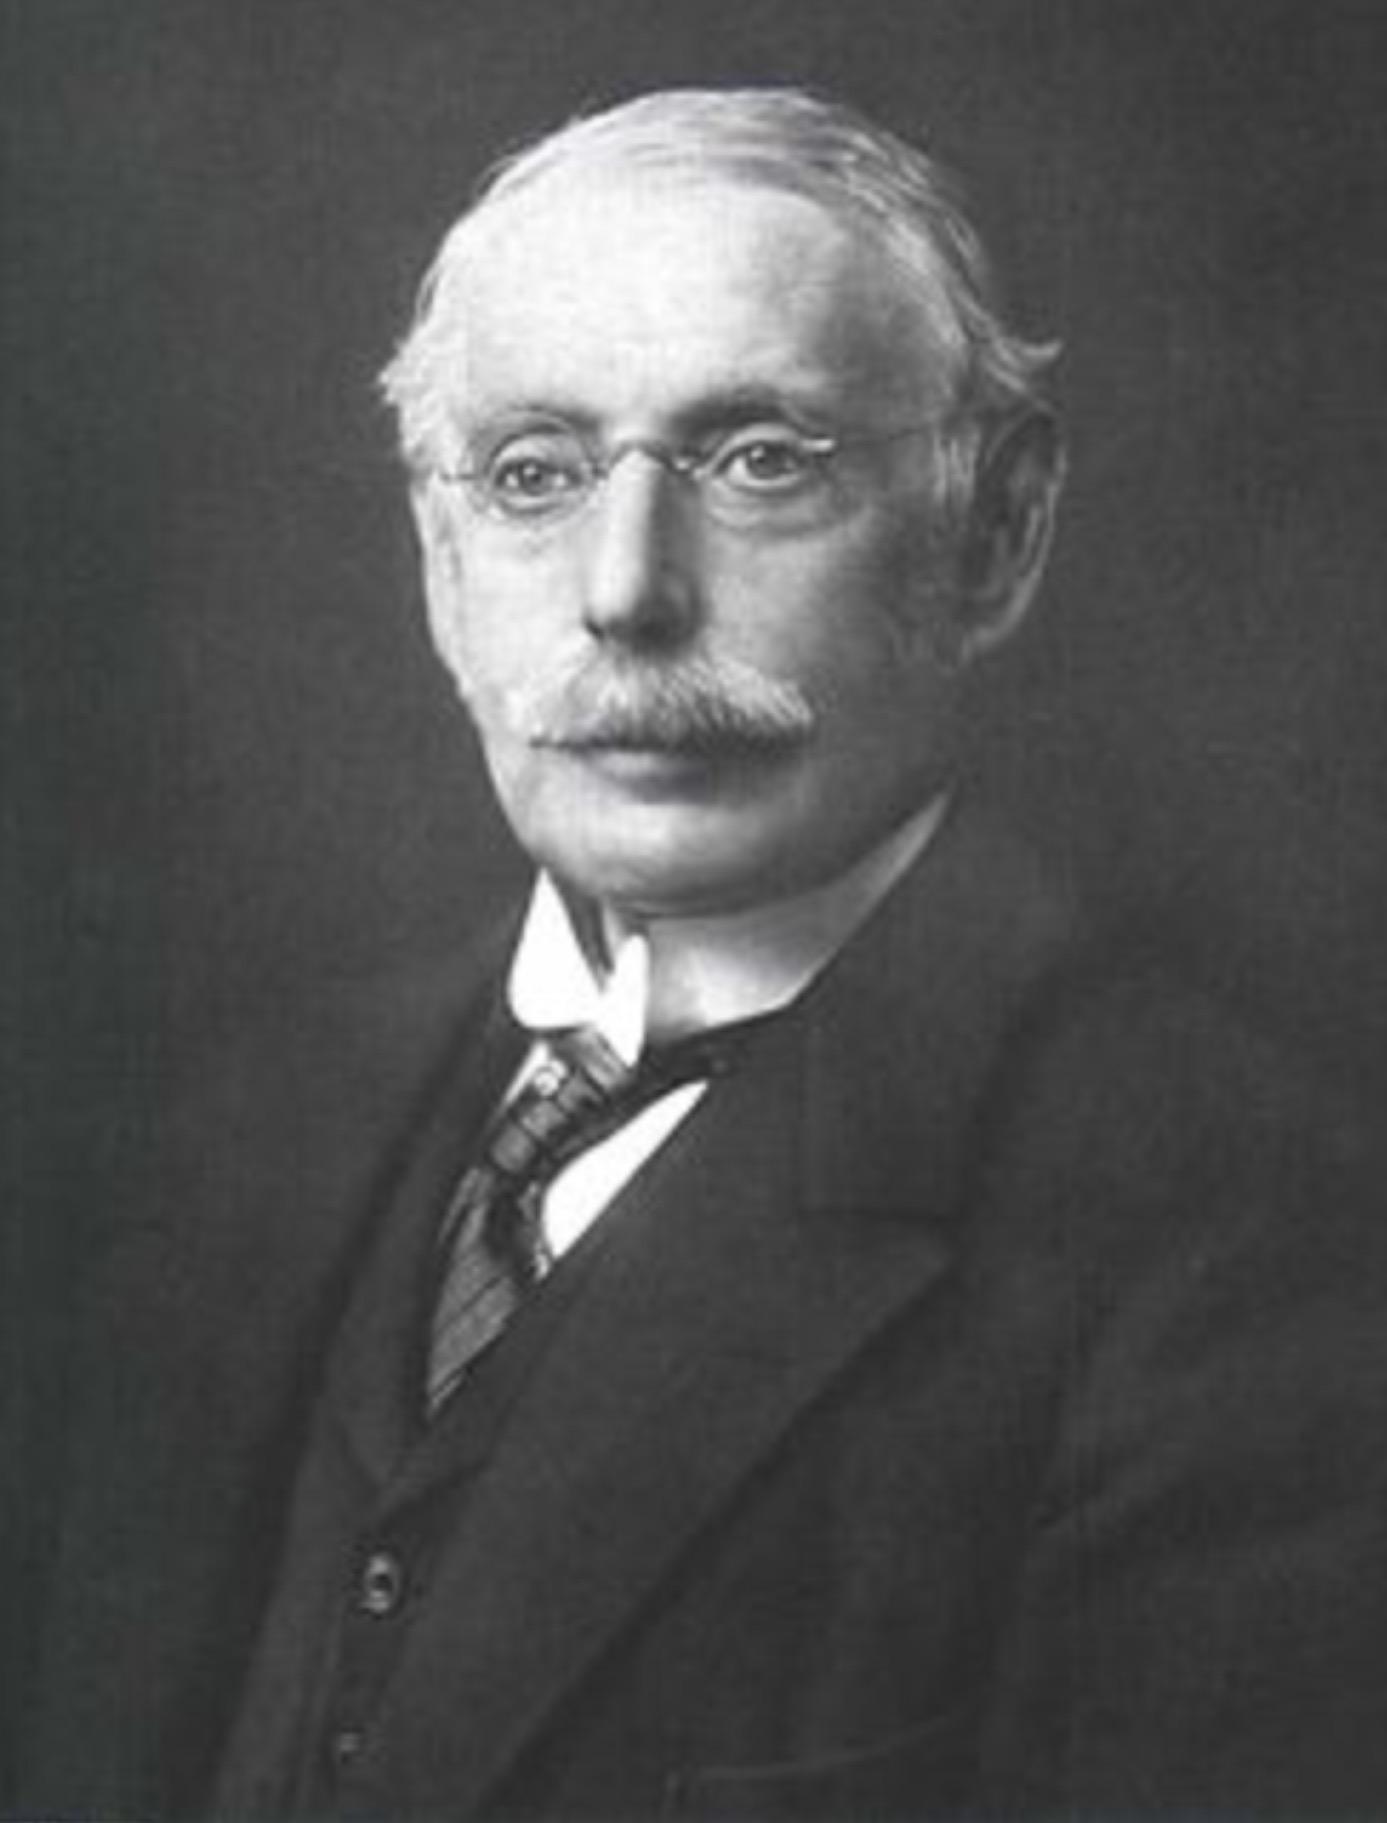 Charles Parsons